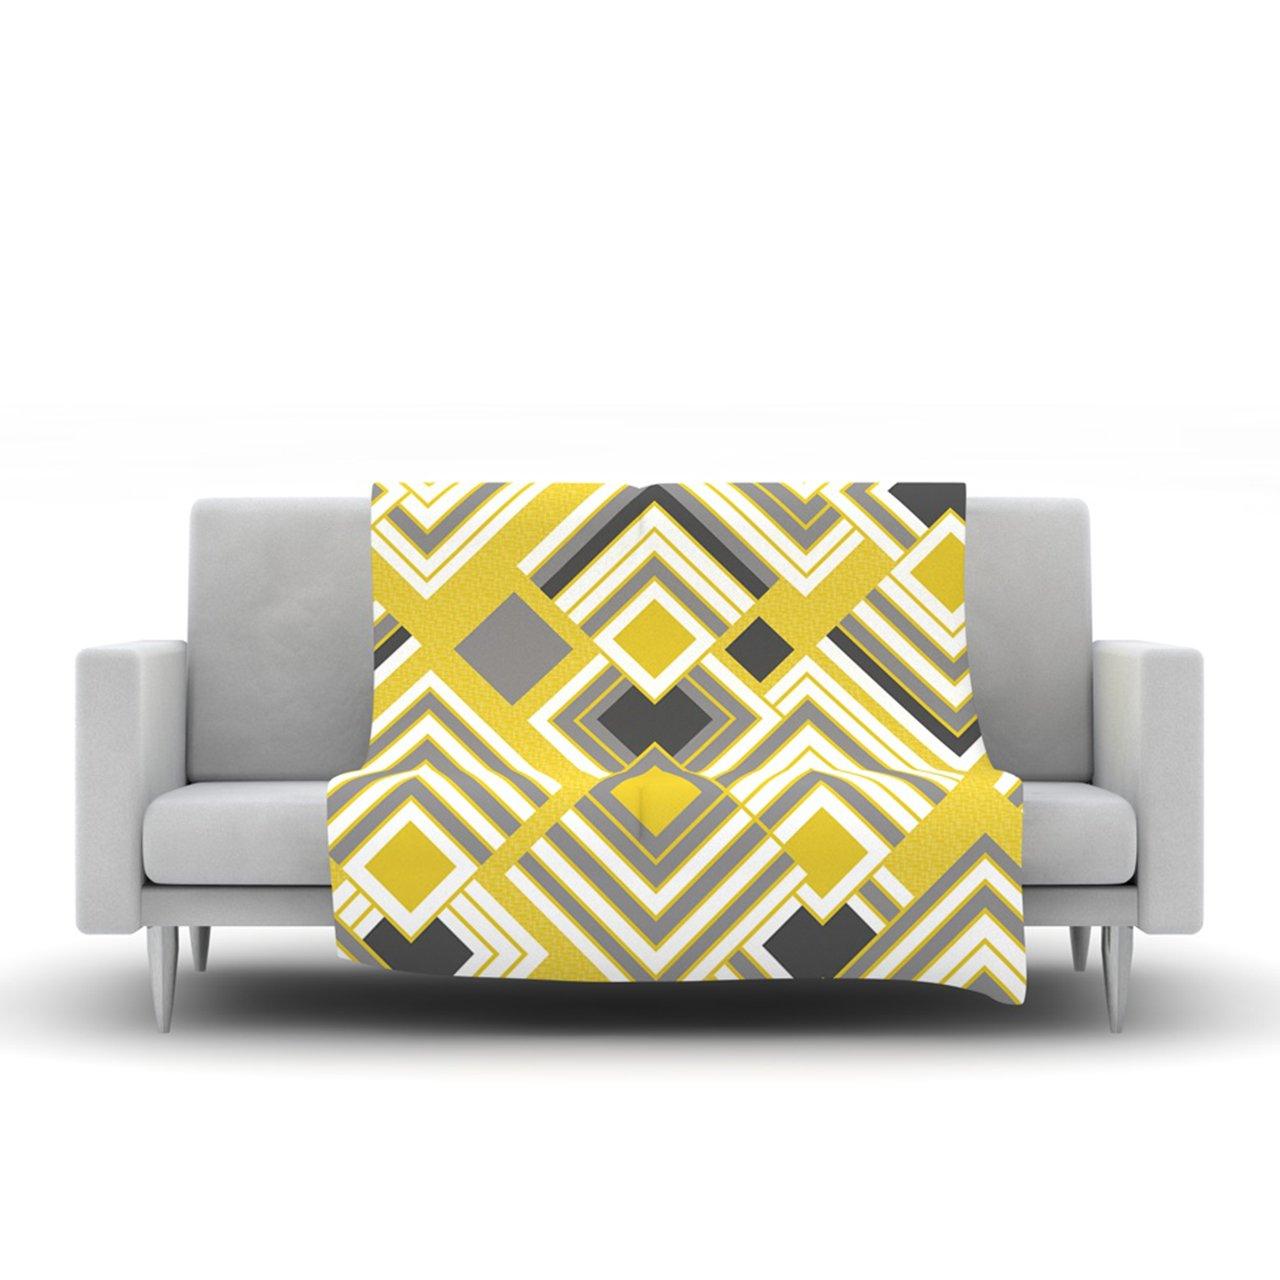 Kess InHouse Jacqueline Milton Luca-Gold Yellow Gray Fleece Throw Blanket 80 by 60